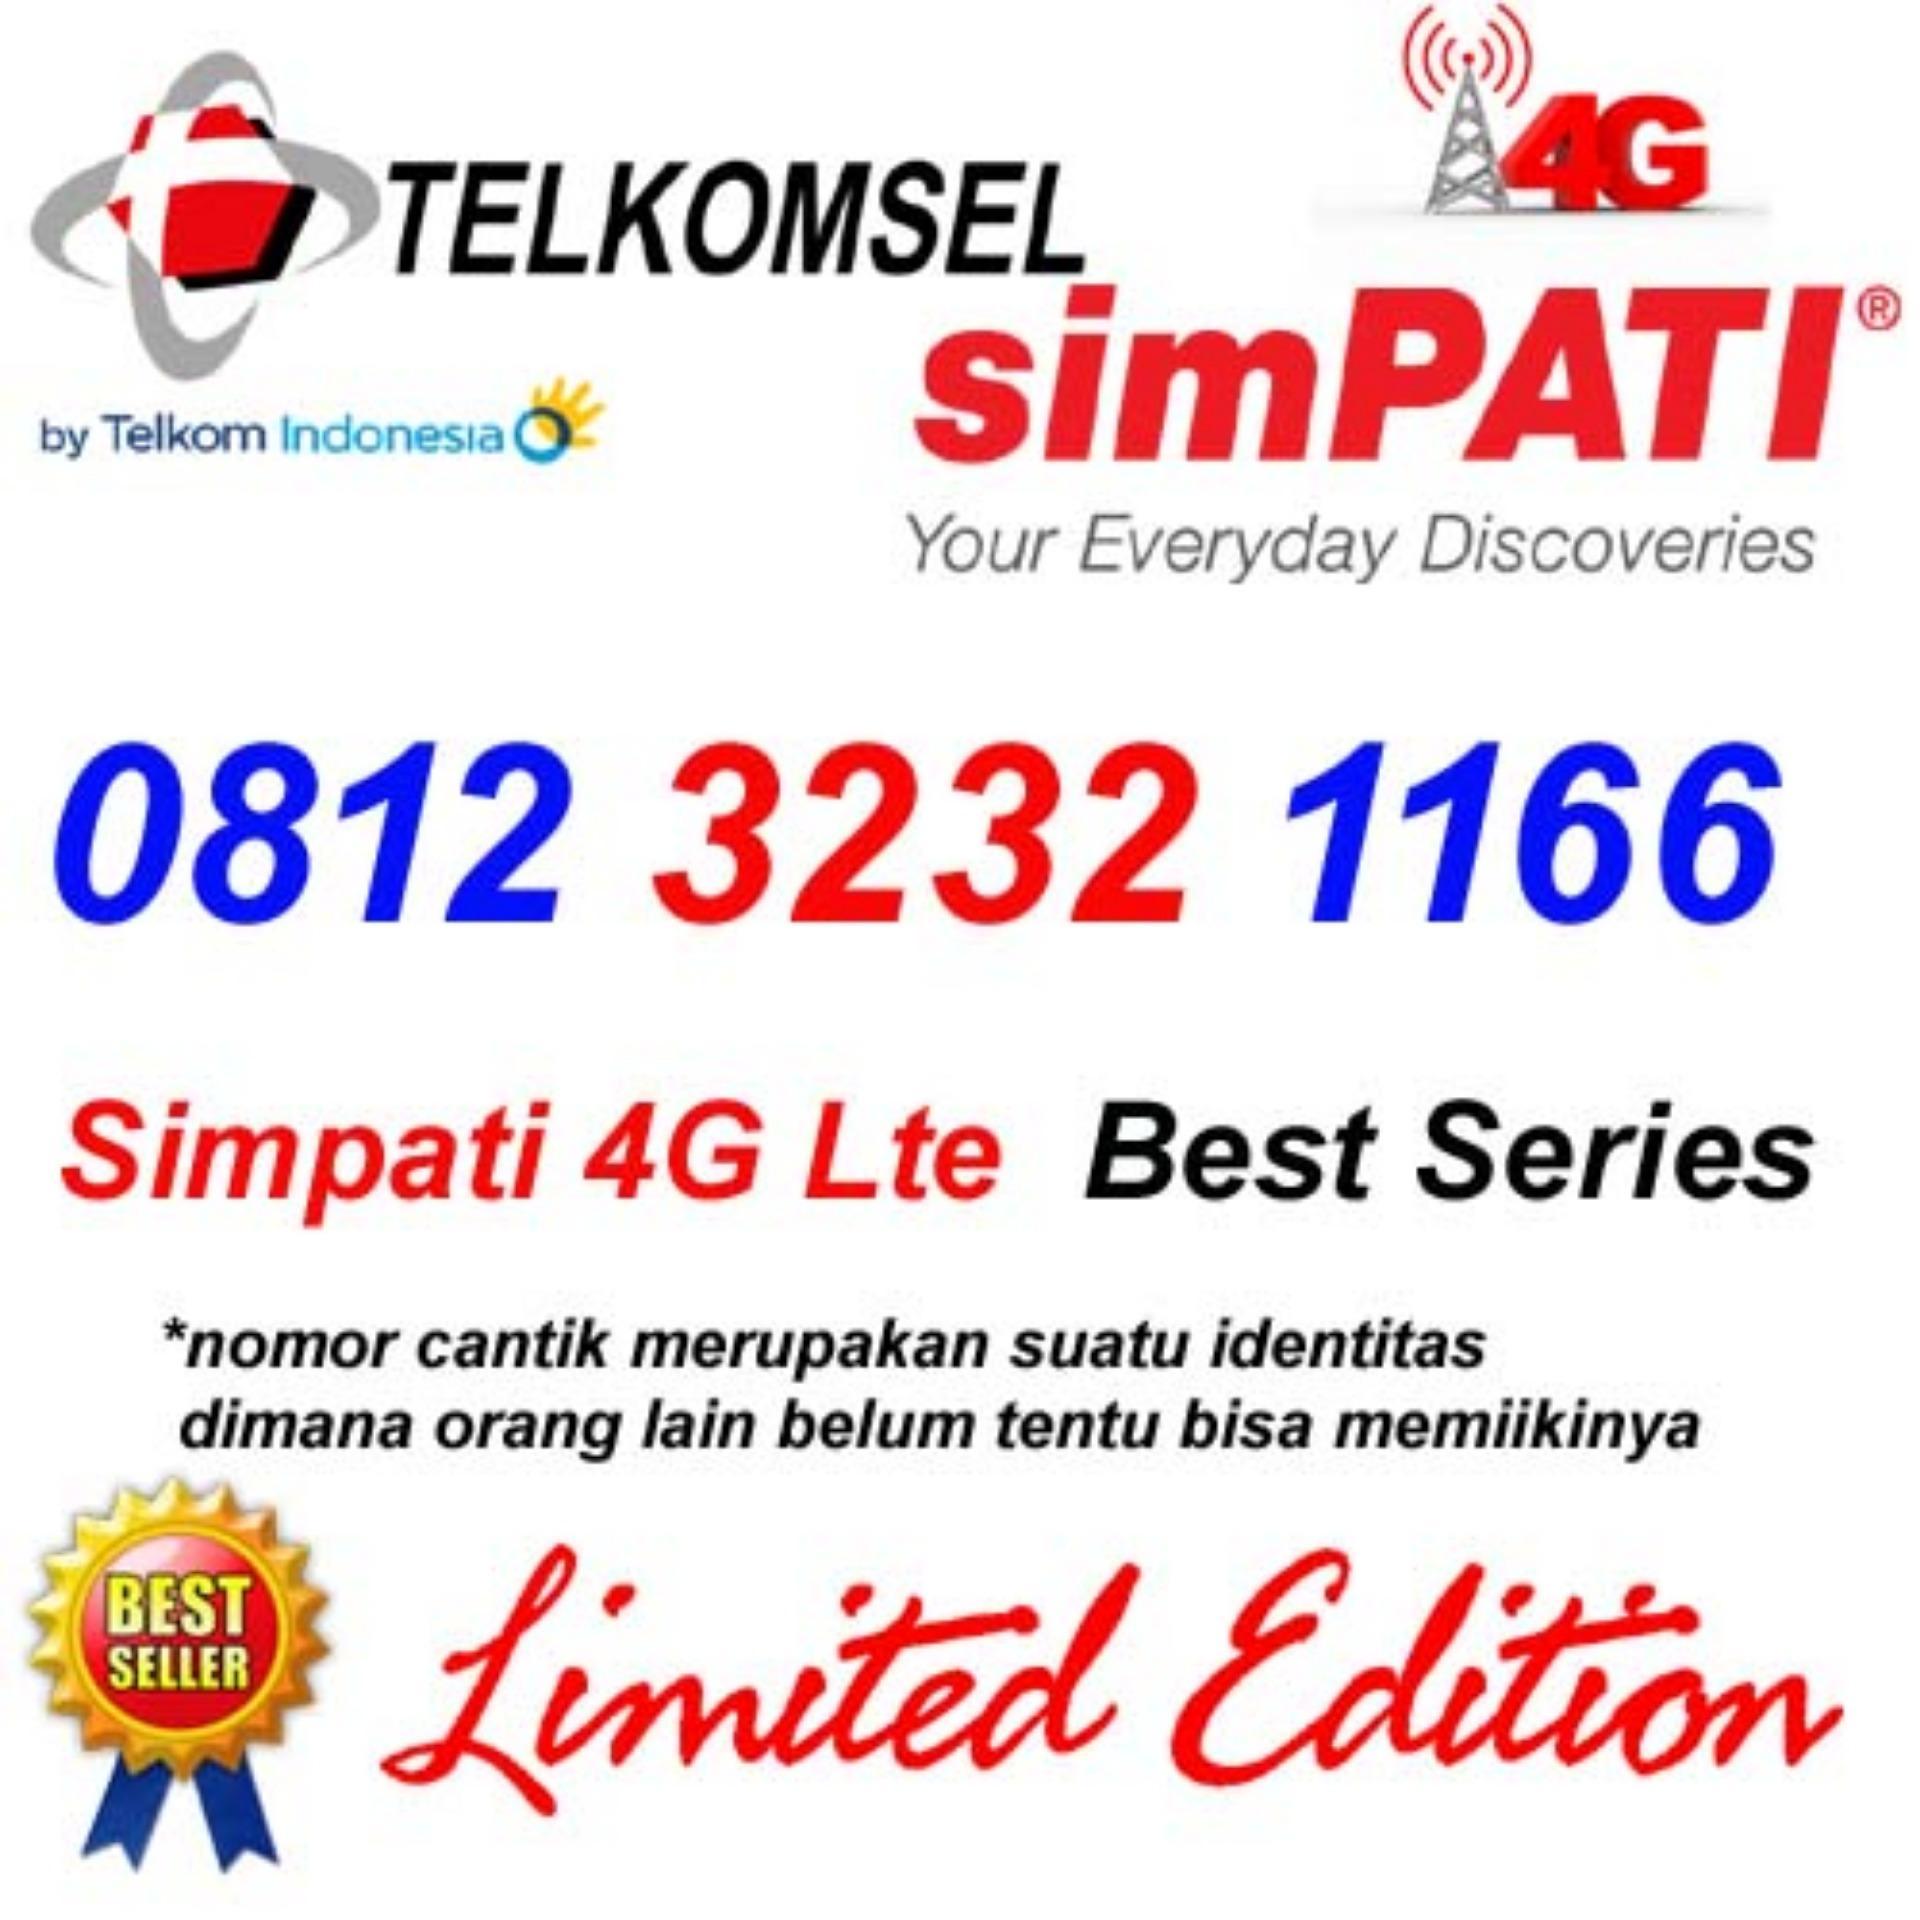 Telkomsel Simpati 4G Lte 0812 3232 1166 Kartu Perdana Nomor cantik